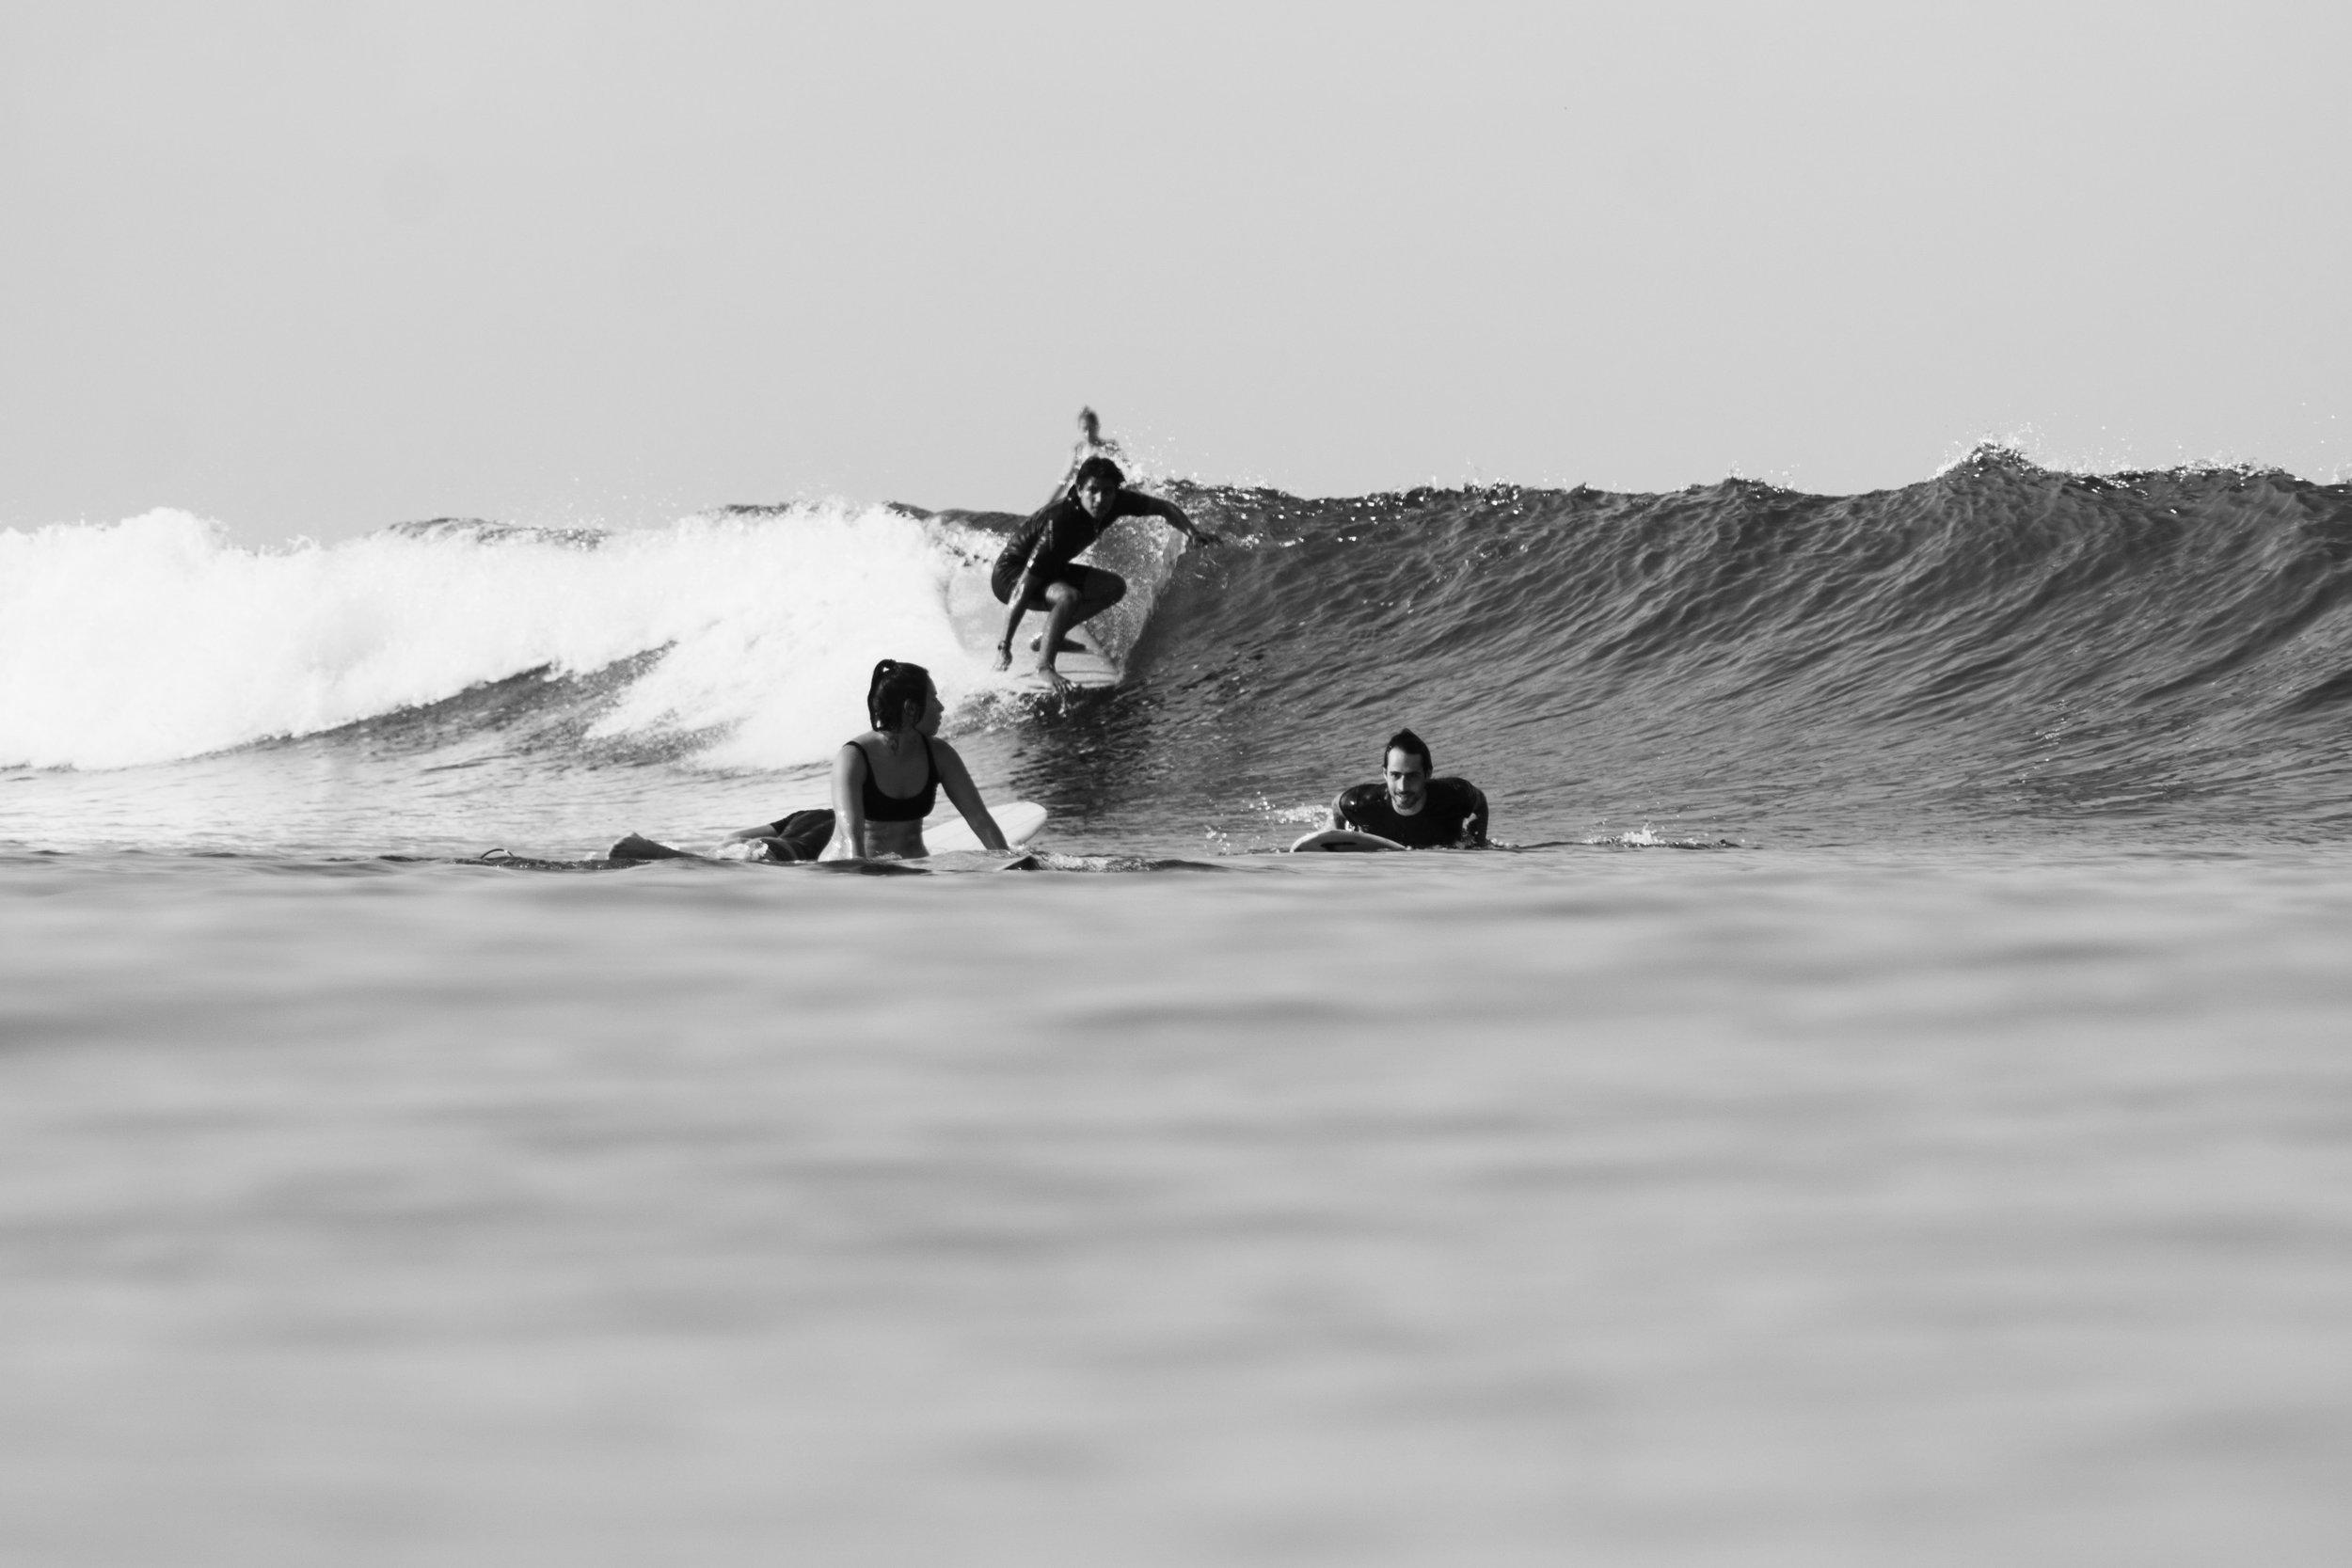 Surf-Mexico-Zihuatanejo-Sayulita-Ixtapa-Zihuatanejo-Diego-Cadena-Olas-Fotografia-Heiko-Bothe-11.jpg